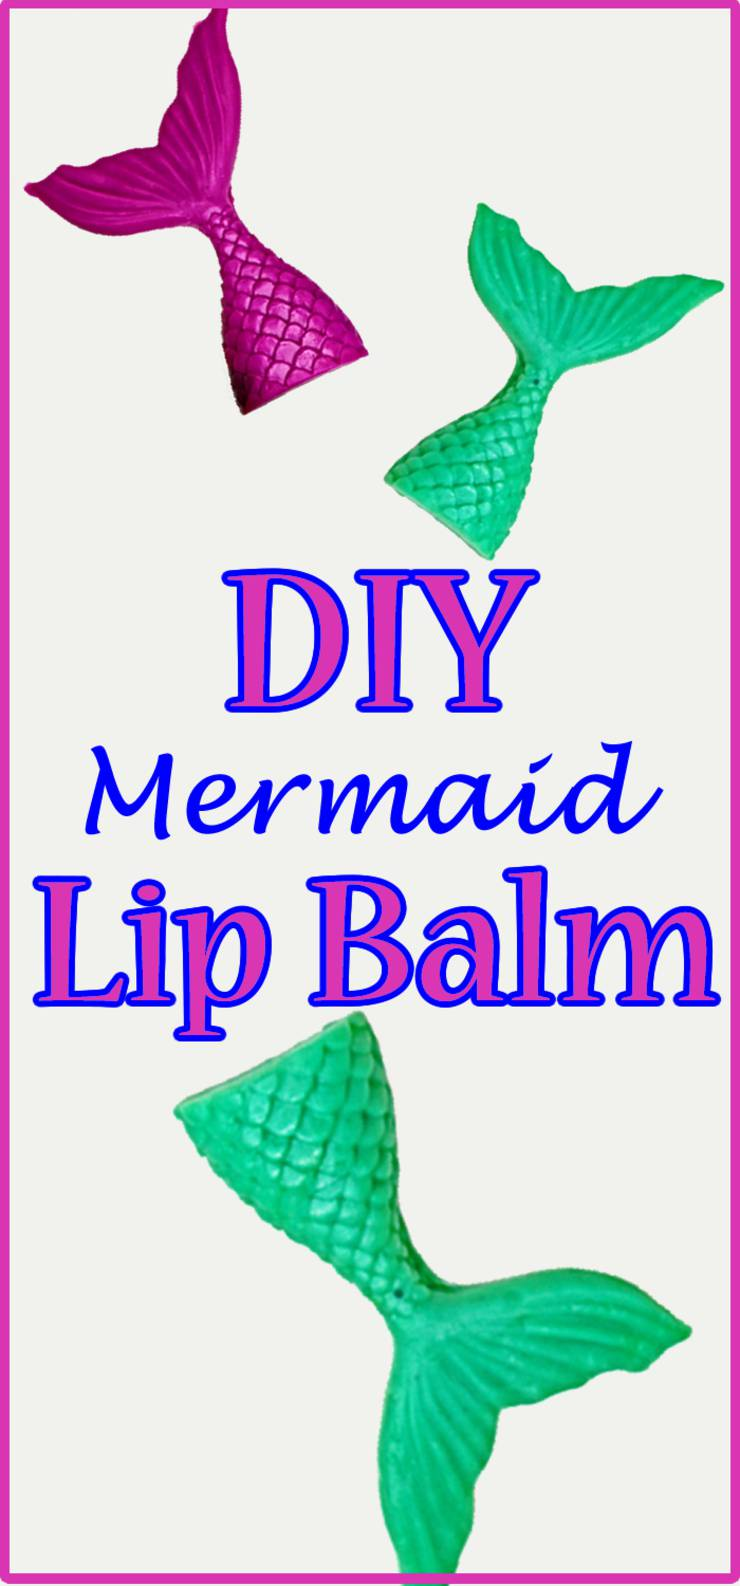 diy mermaid lip balm